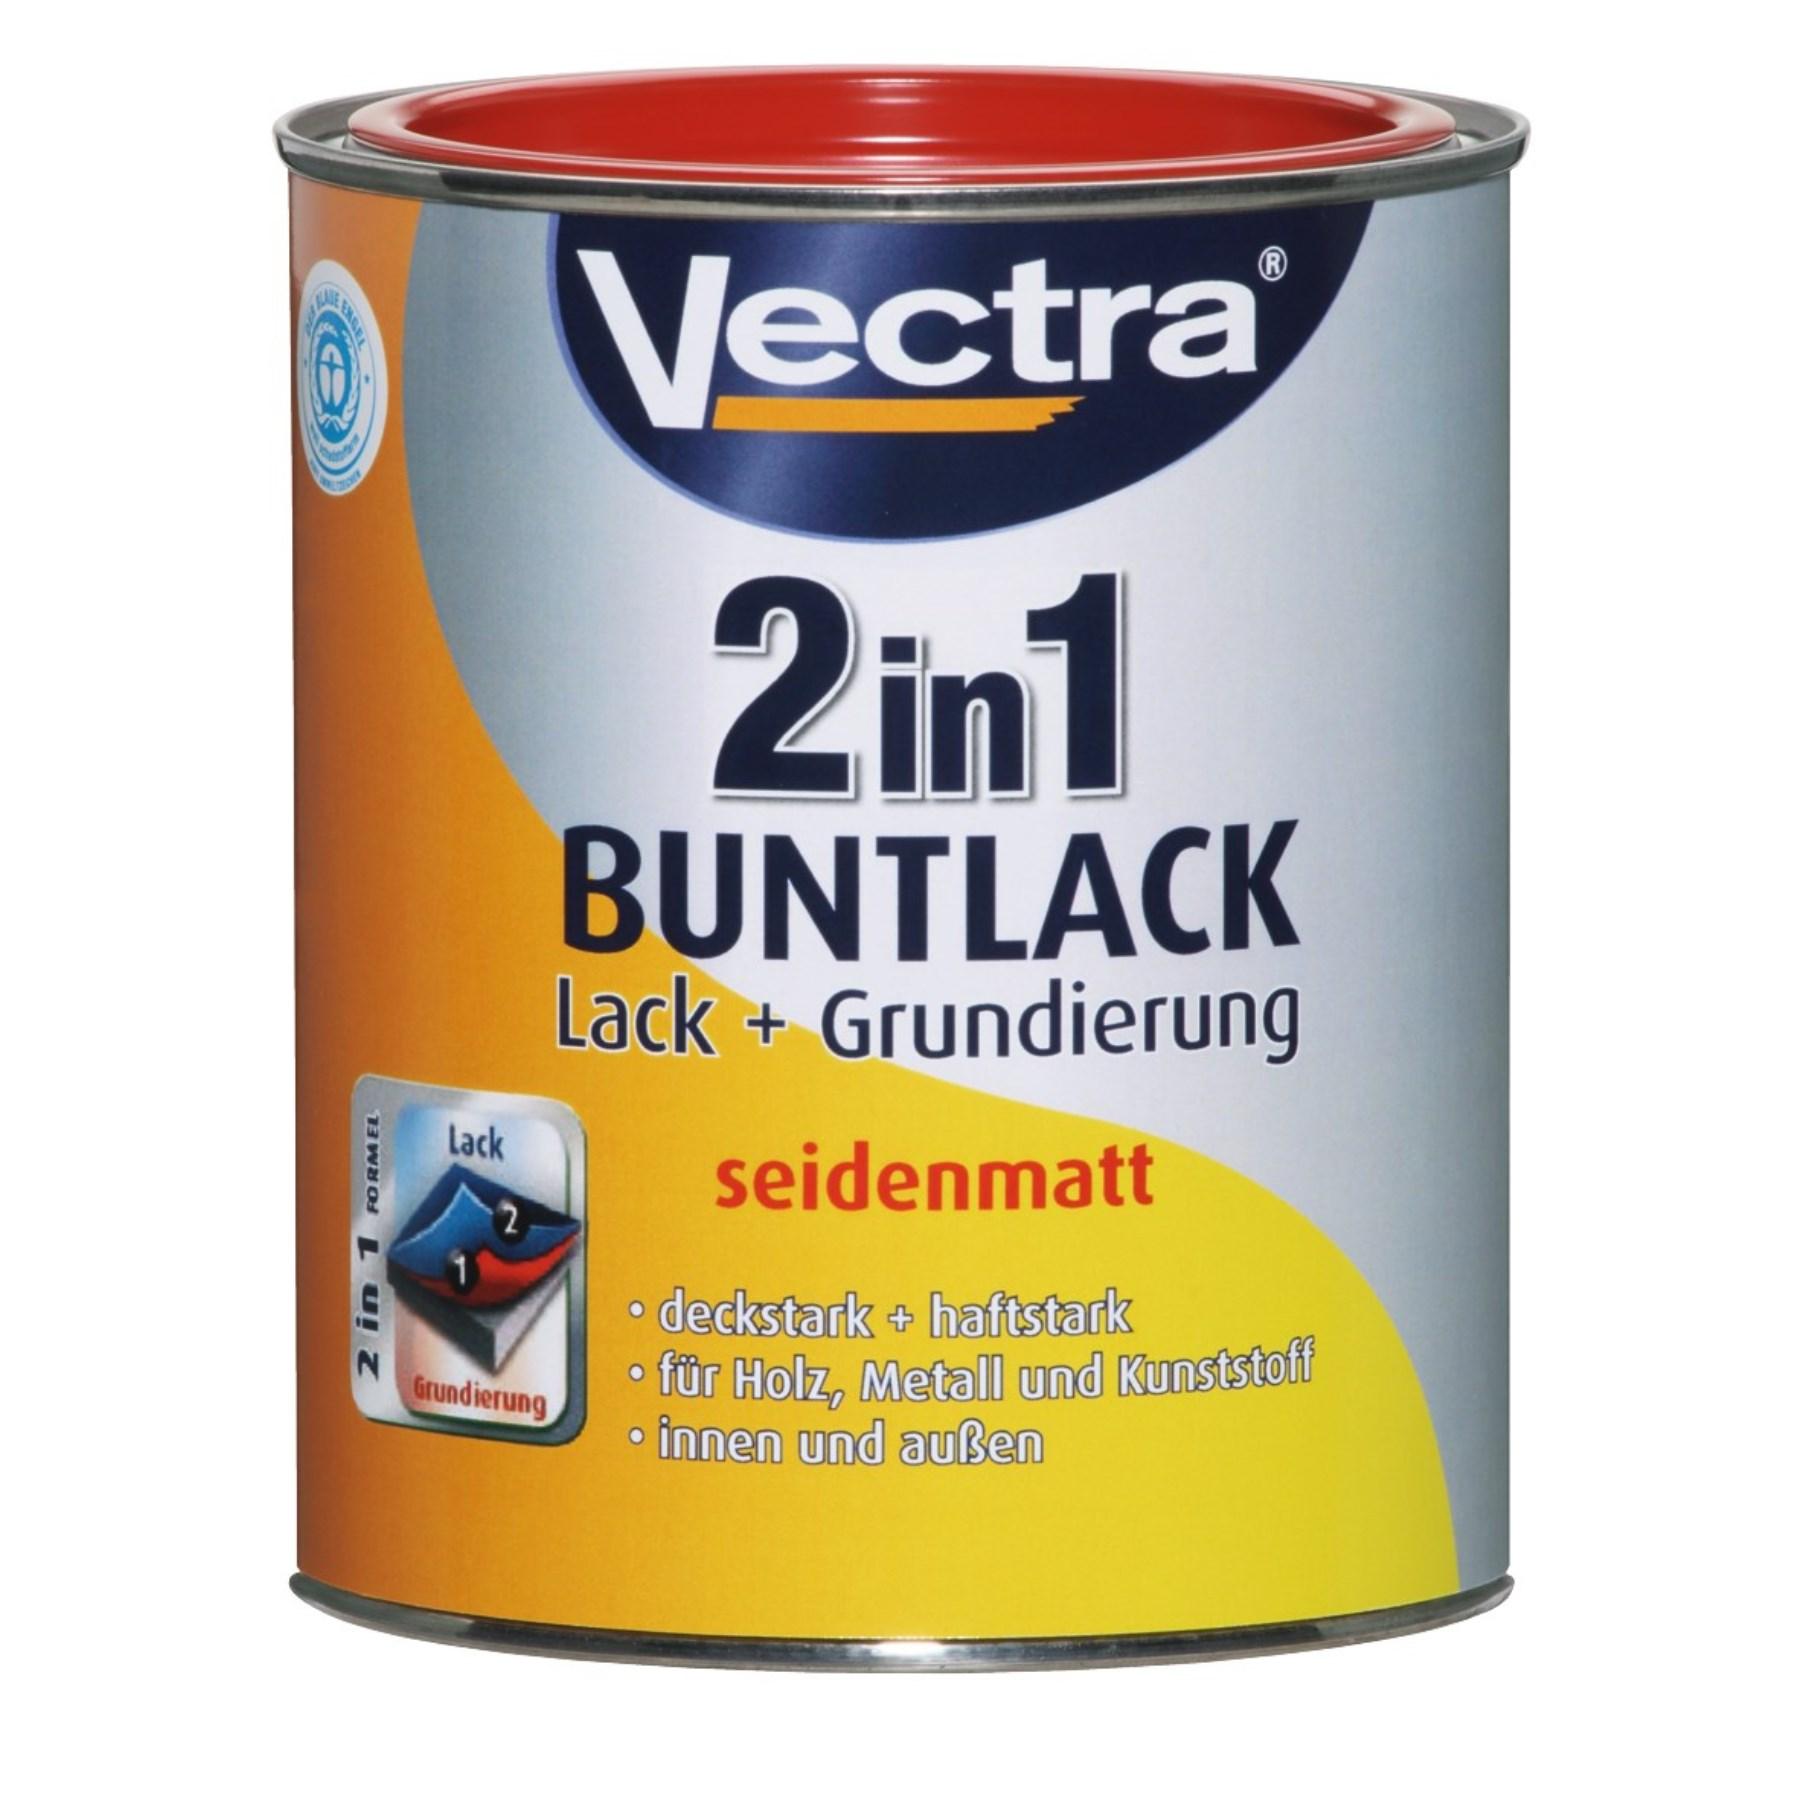 buntlack 2in1 seidenmatt (1205541) - let's doit - starke marken